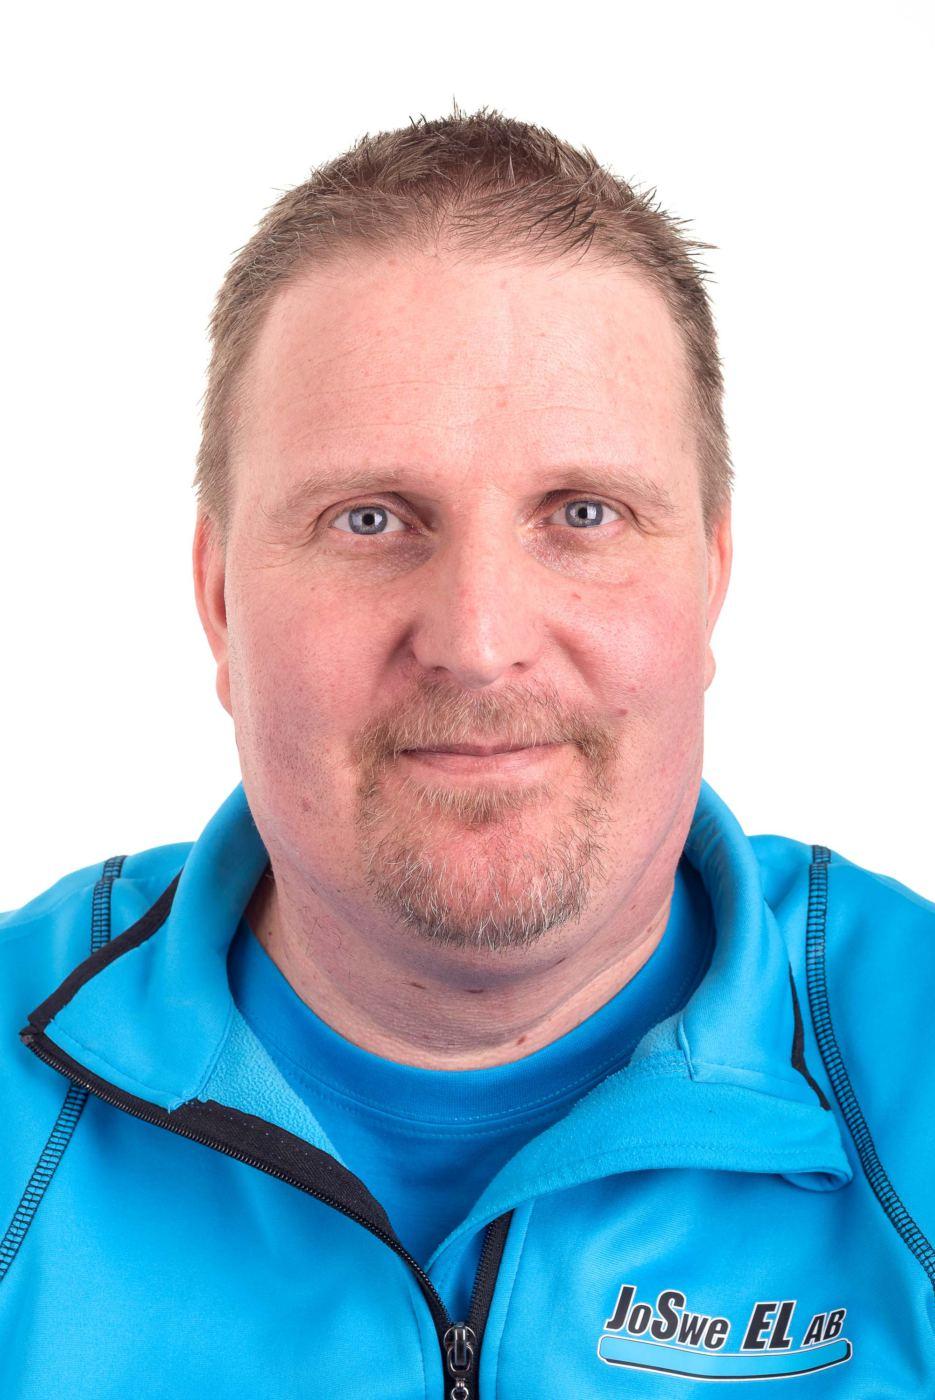 Andreas Olofsson Joswe